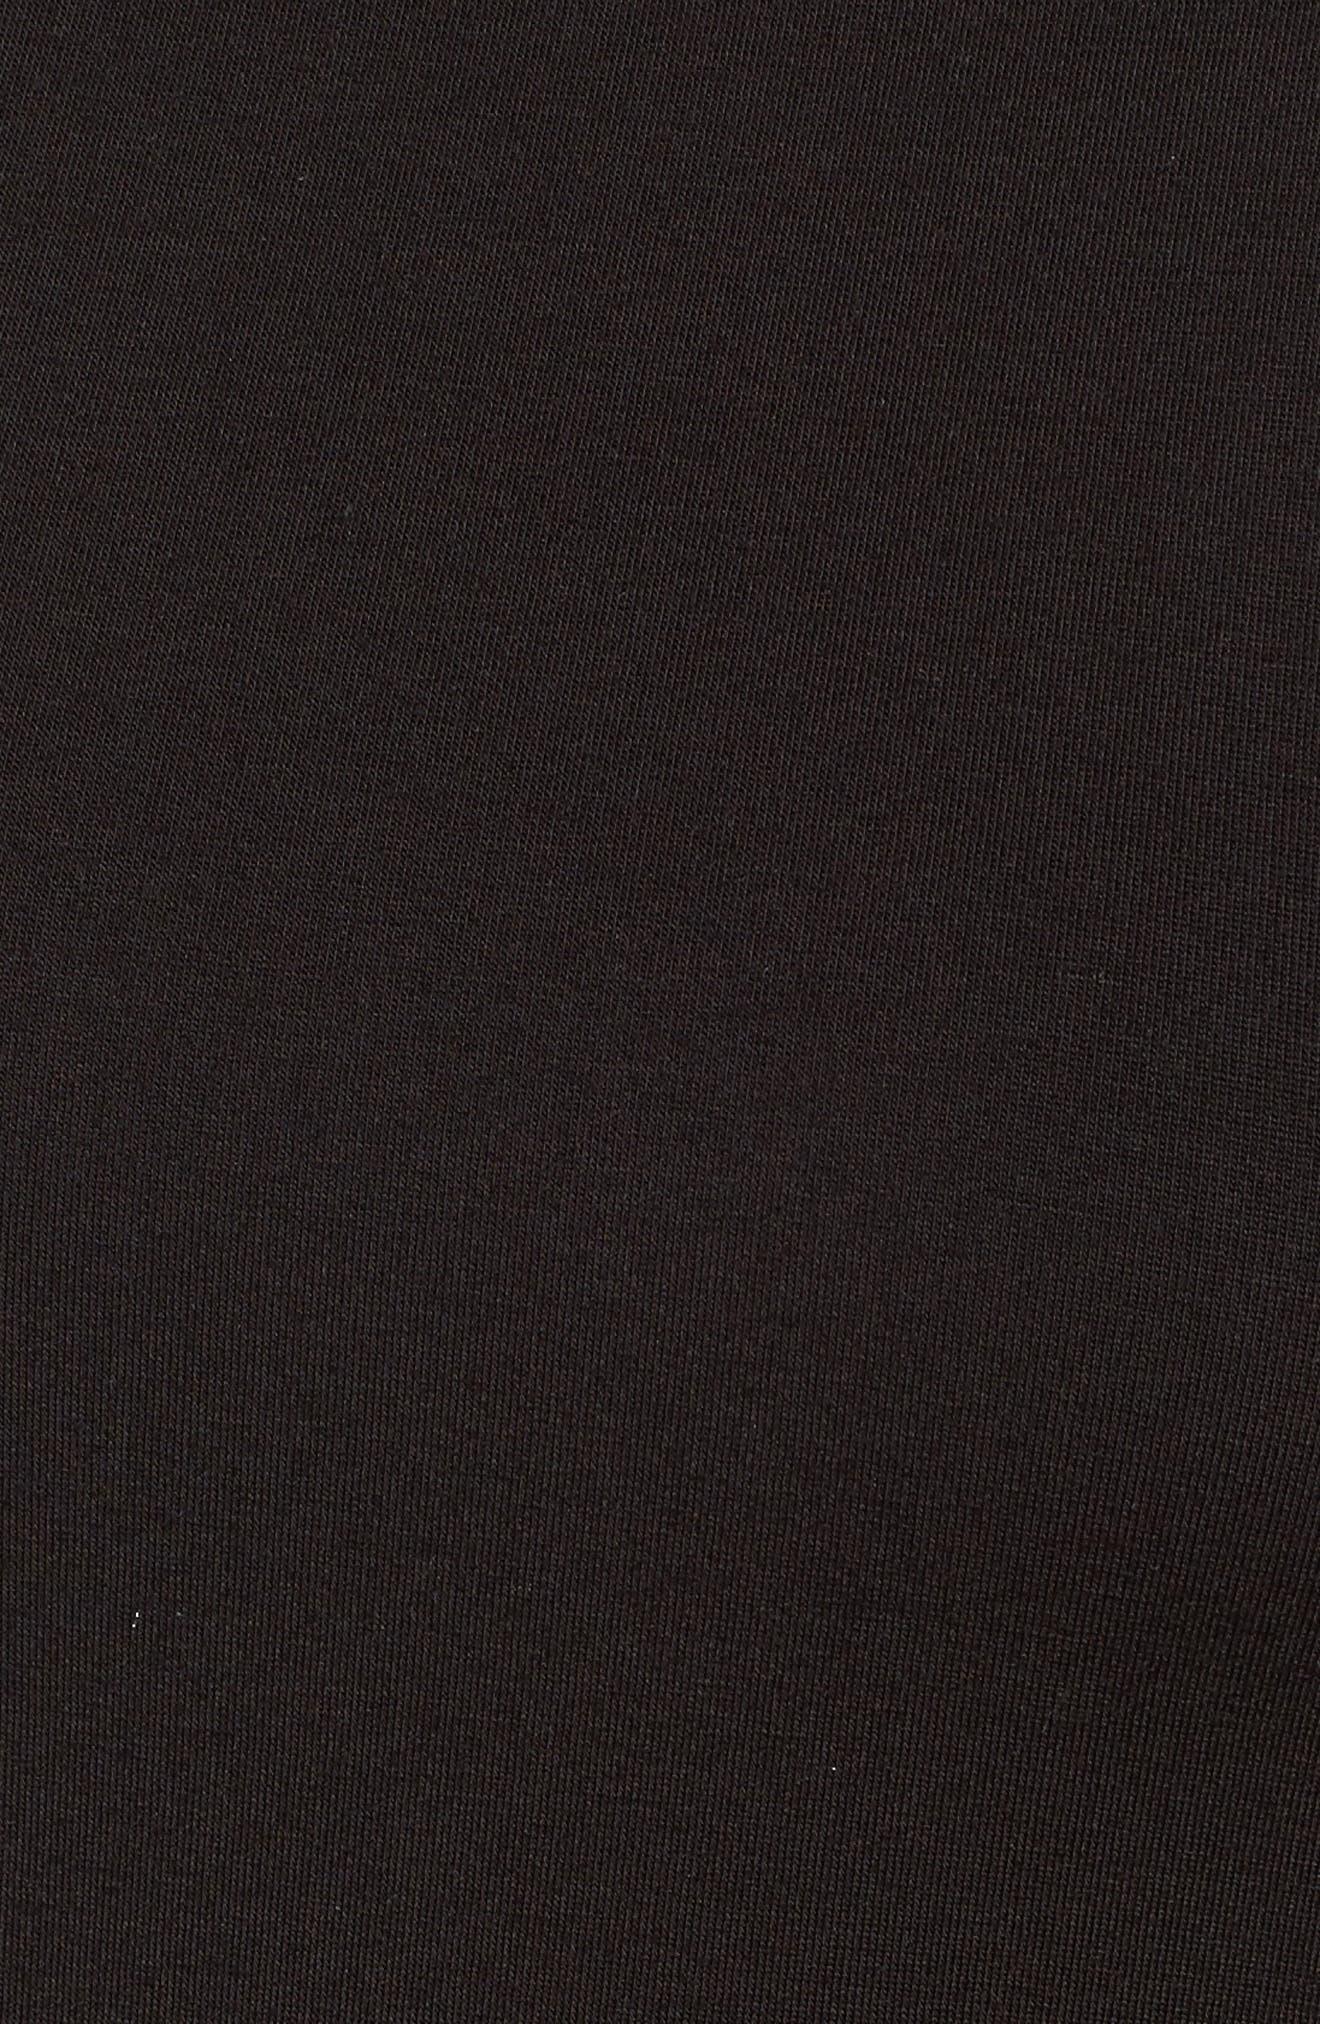 Turtleneck Maxi Dress,                             Alternate thumbnail 5, color,                             010